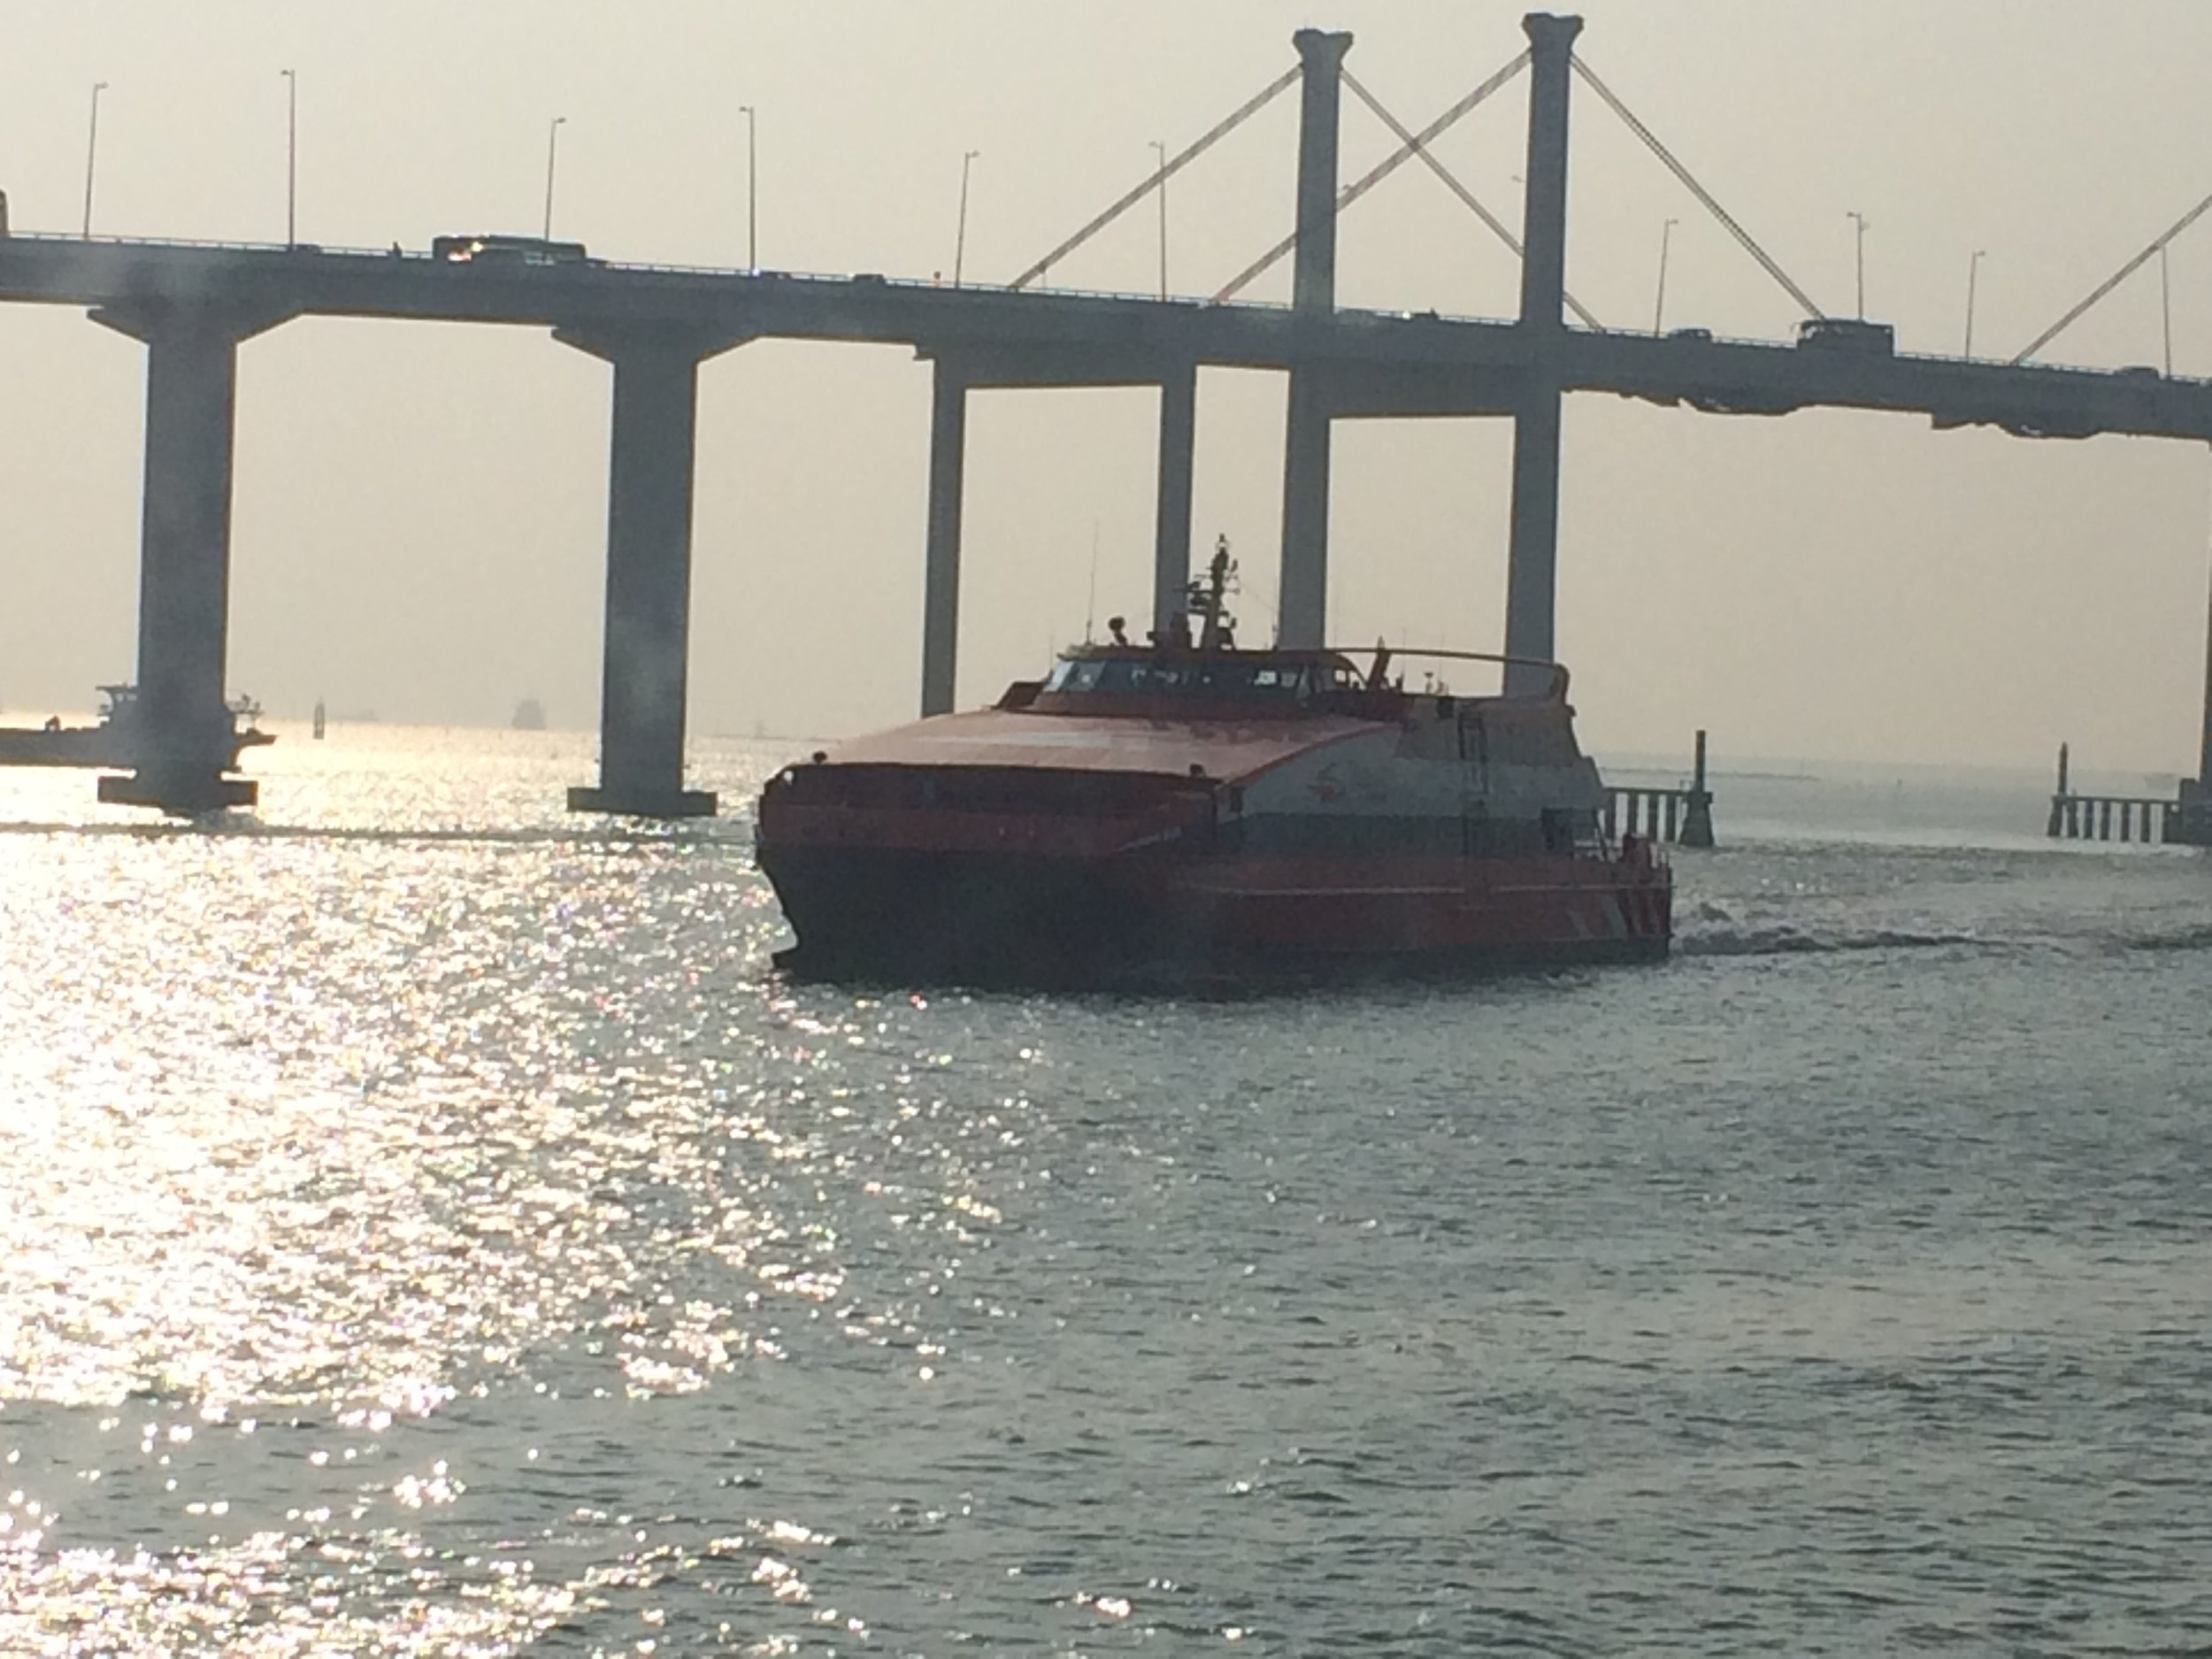 Hong Kong-Macau ferry. Bringing gamblers to the casinos